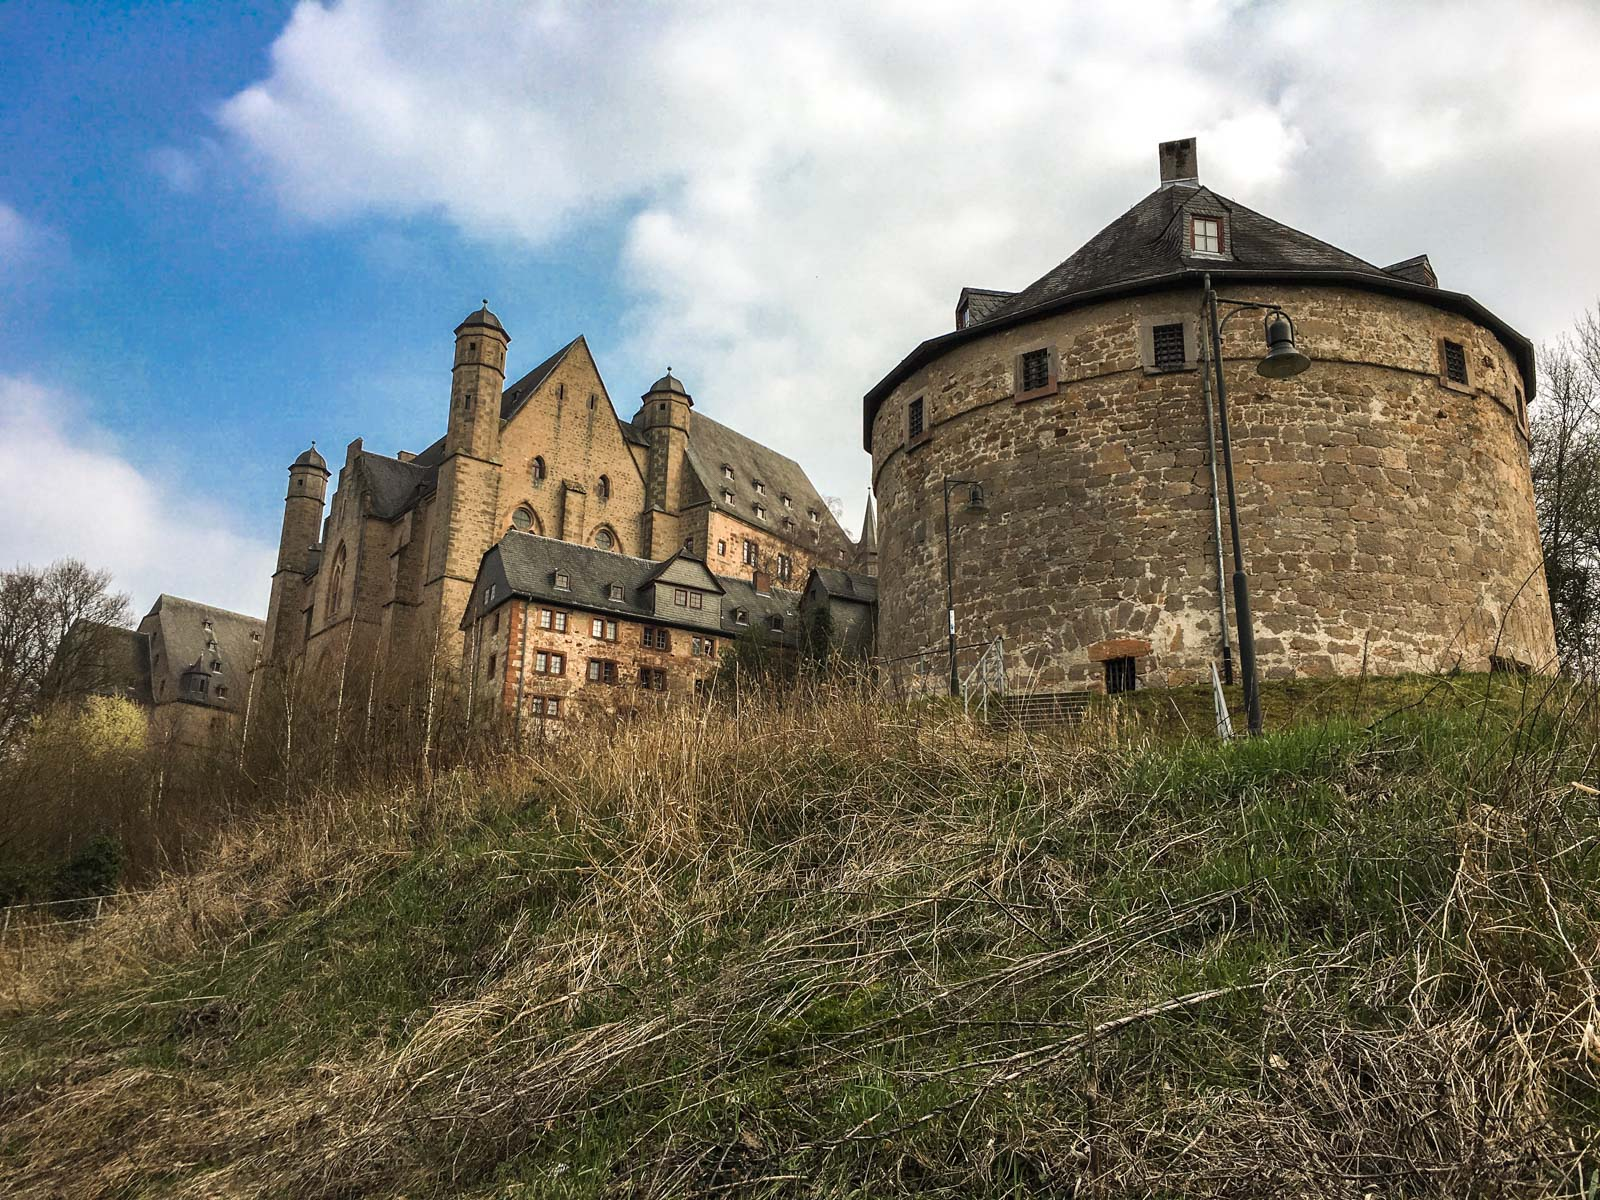 Marburg – Kraina baśni braci Grimm